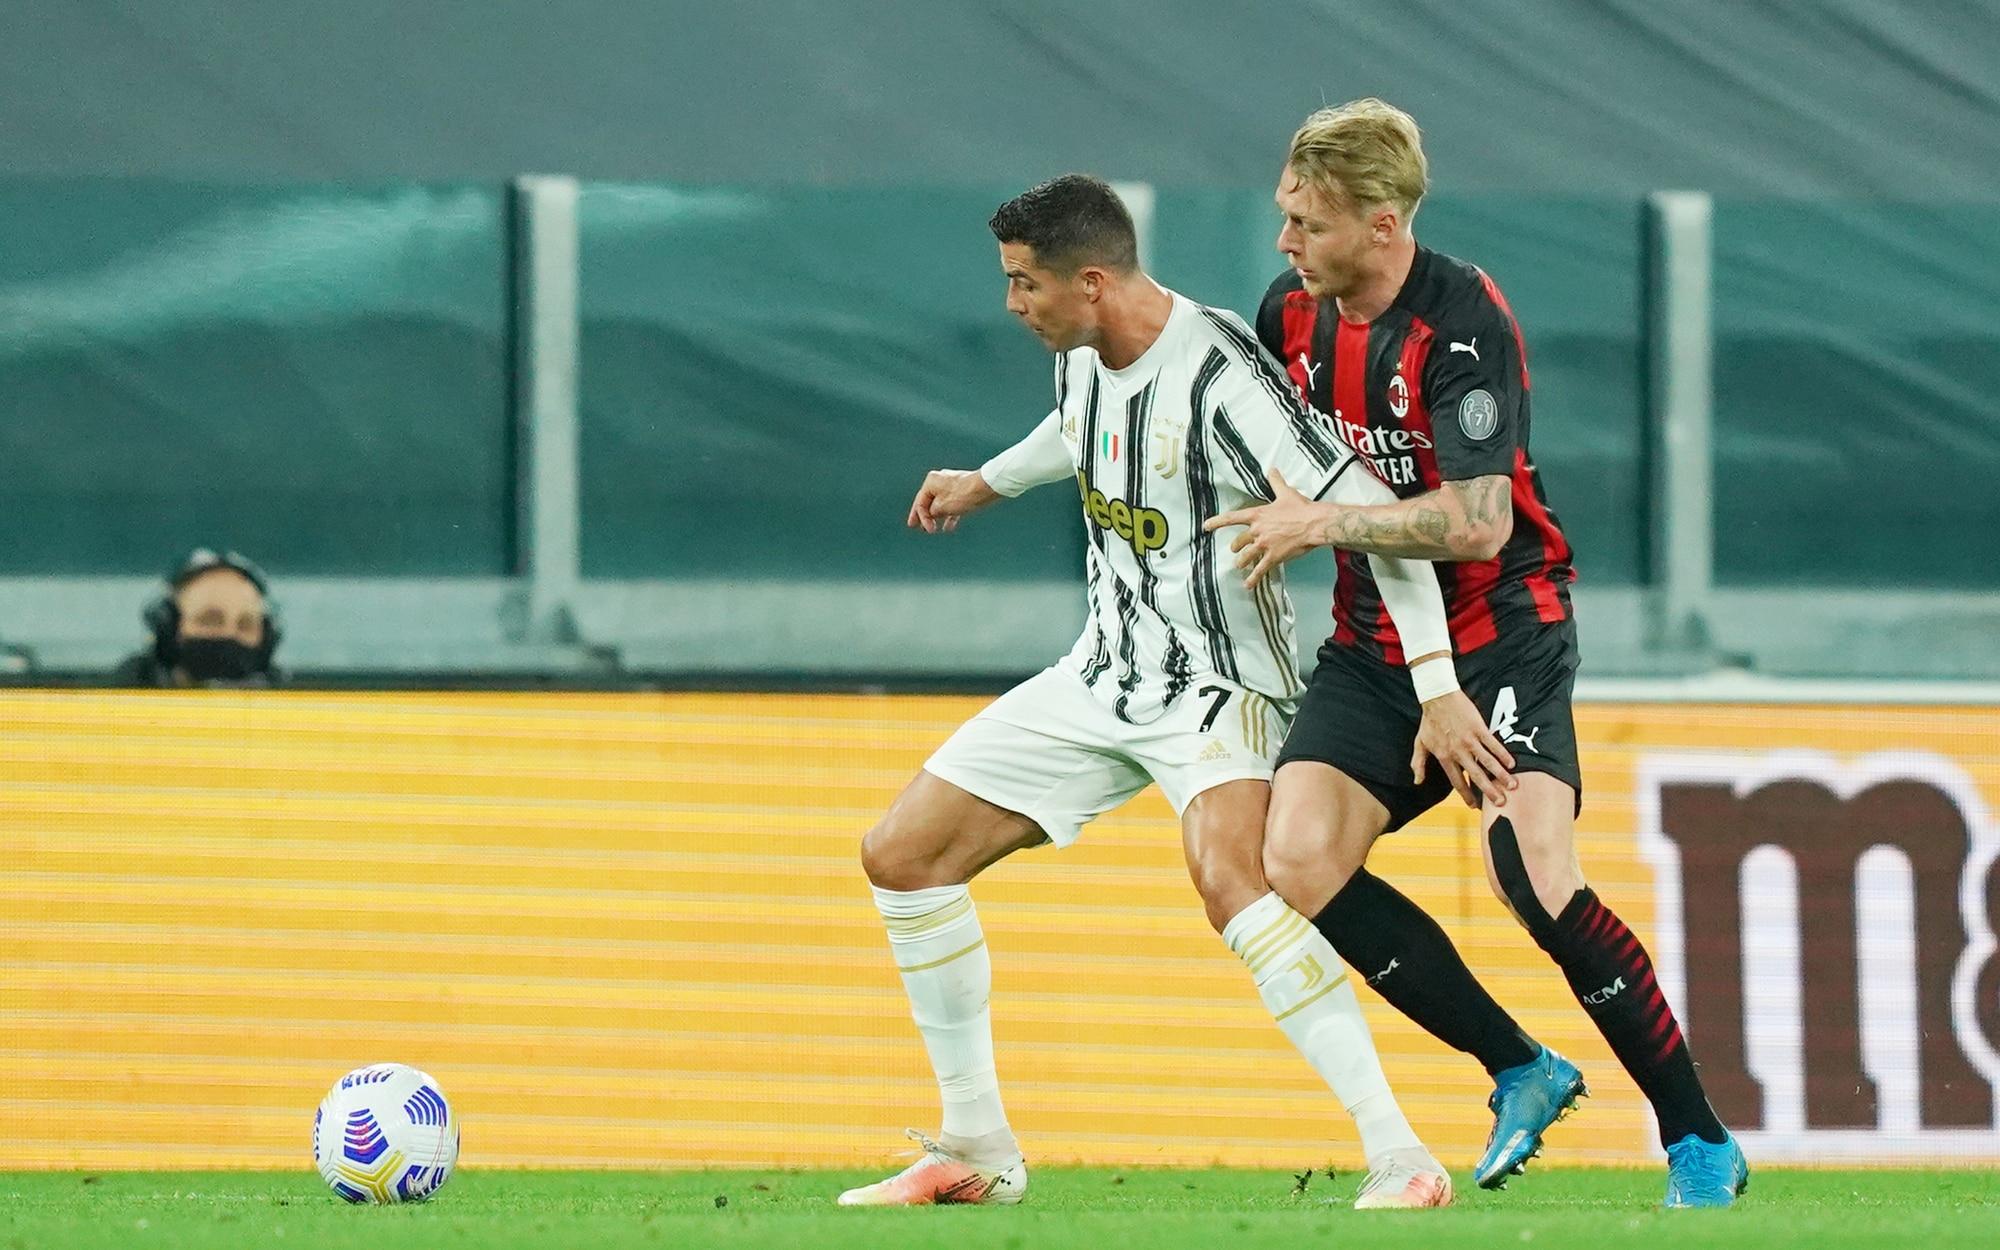 Ronaldo mờ nhạt trong sự kèm cặp của Kjaer. Ảnh: Lapresse